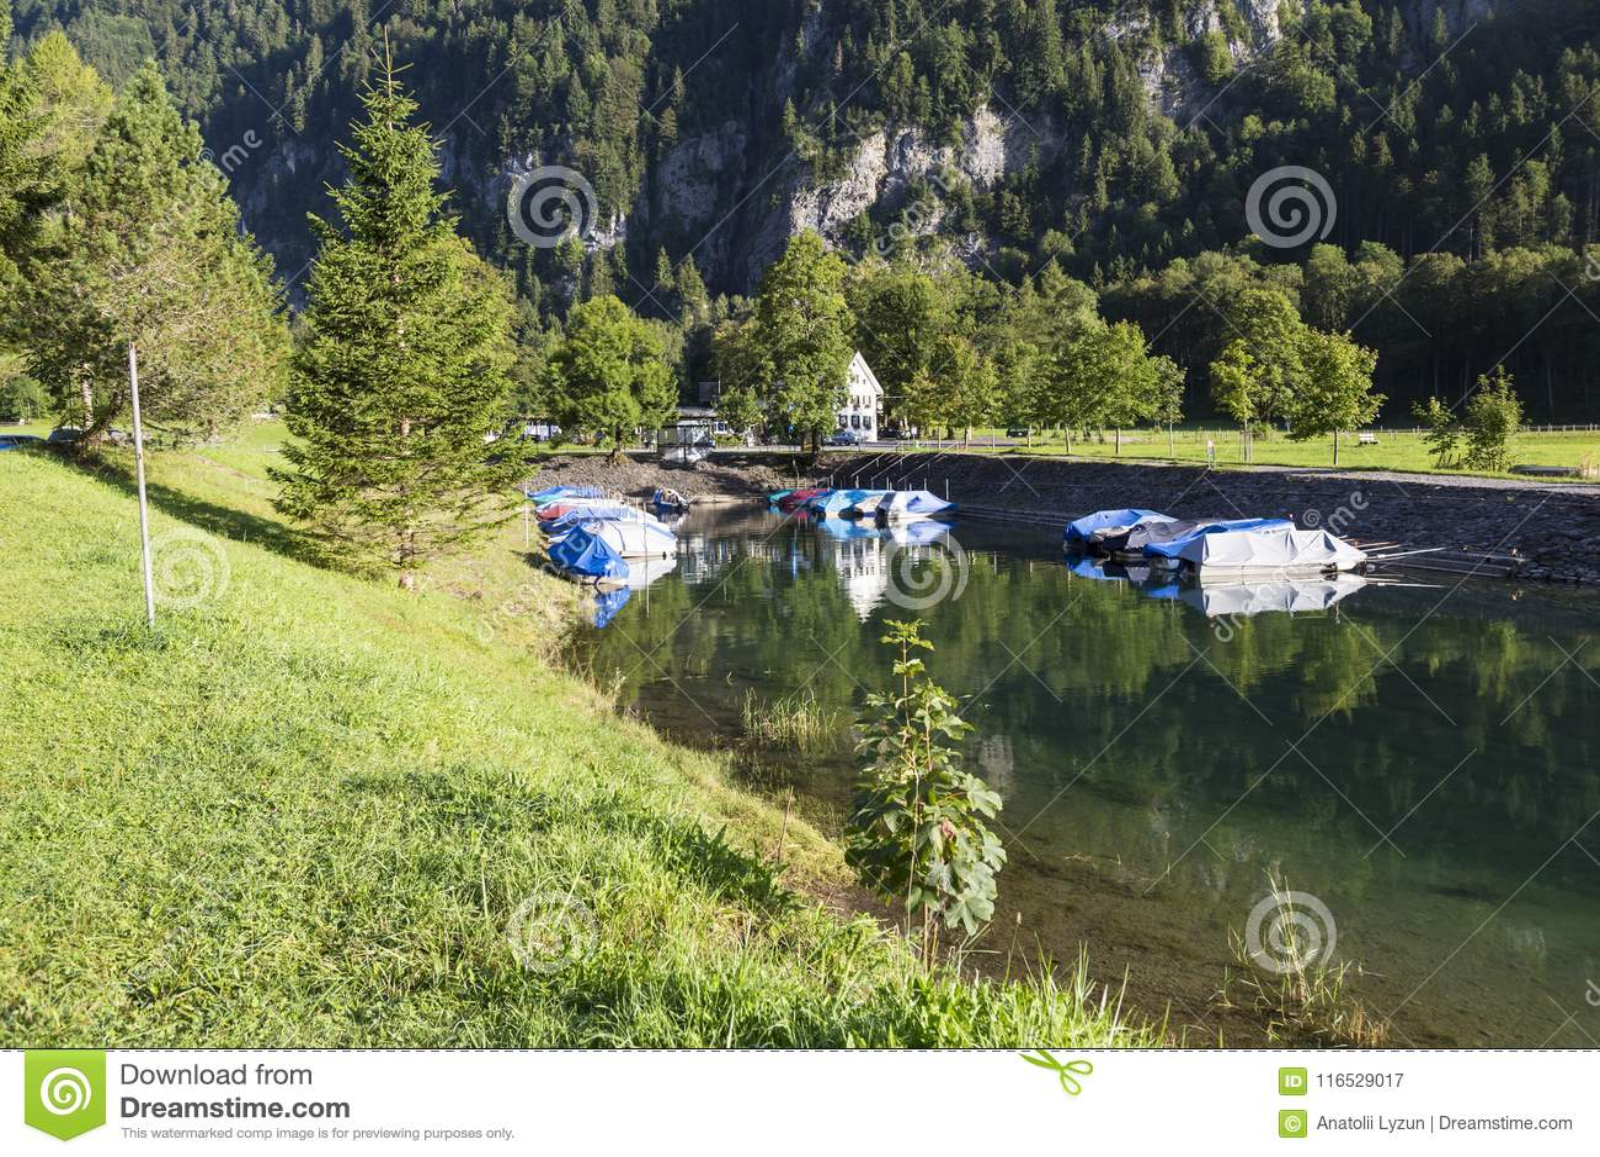 Lake Klontalersee Boats On The Dock Summer In Switzerland Stock